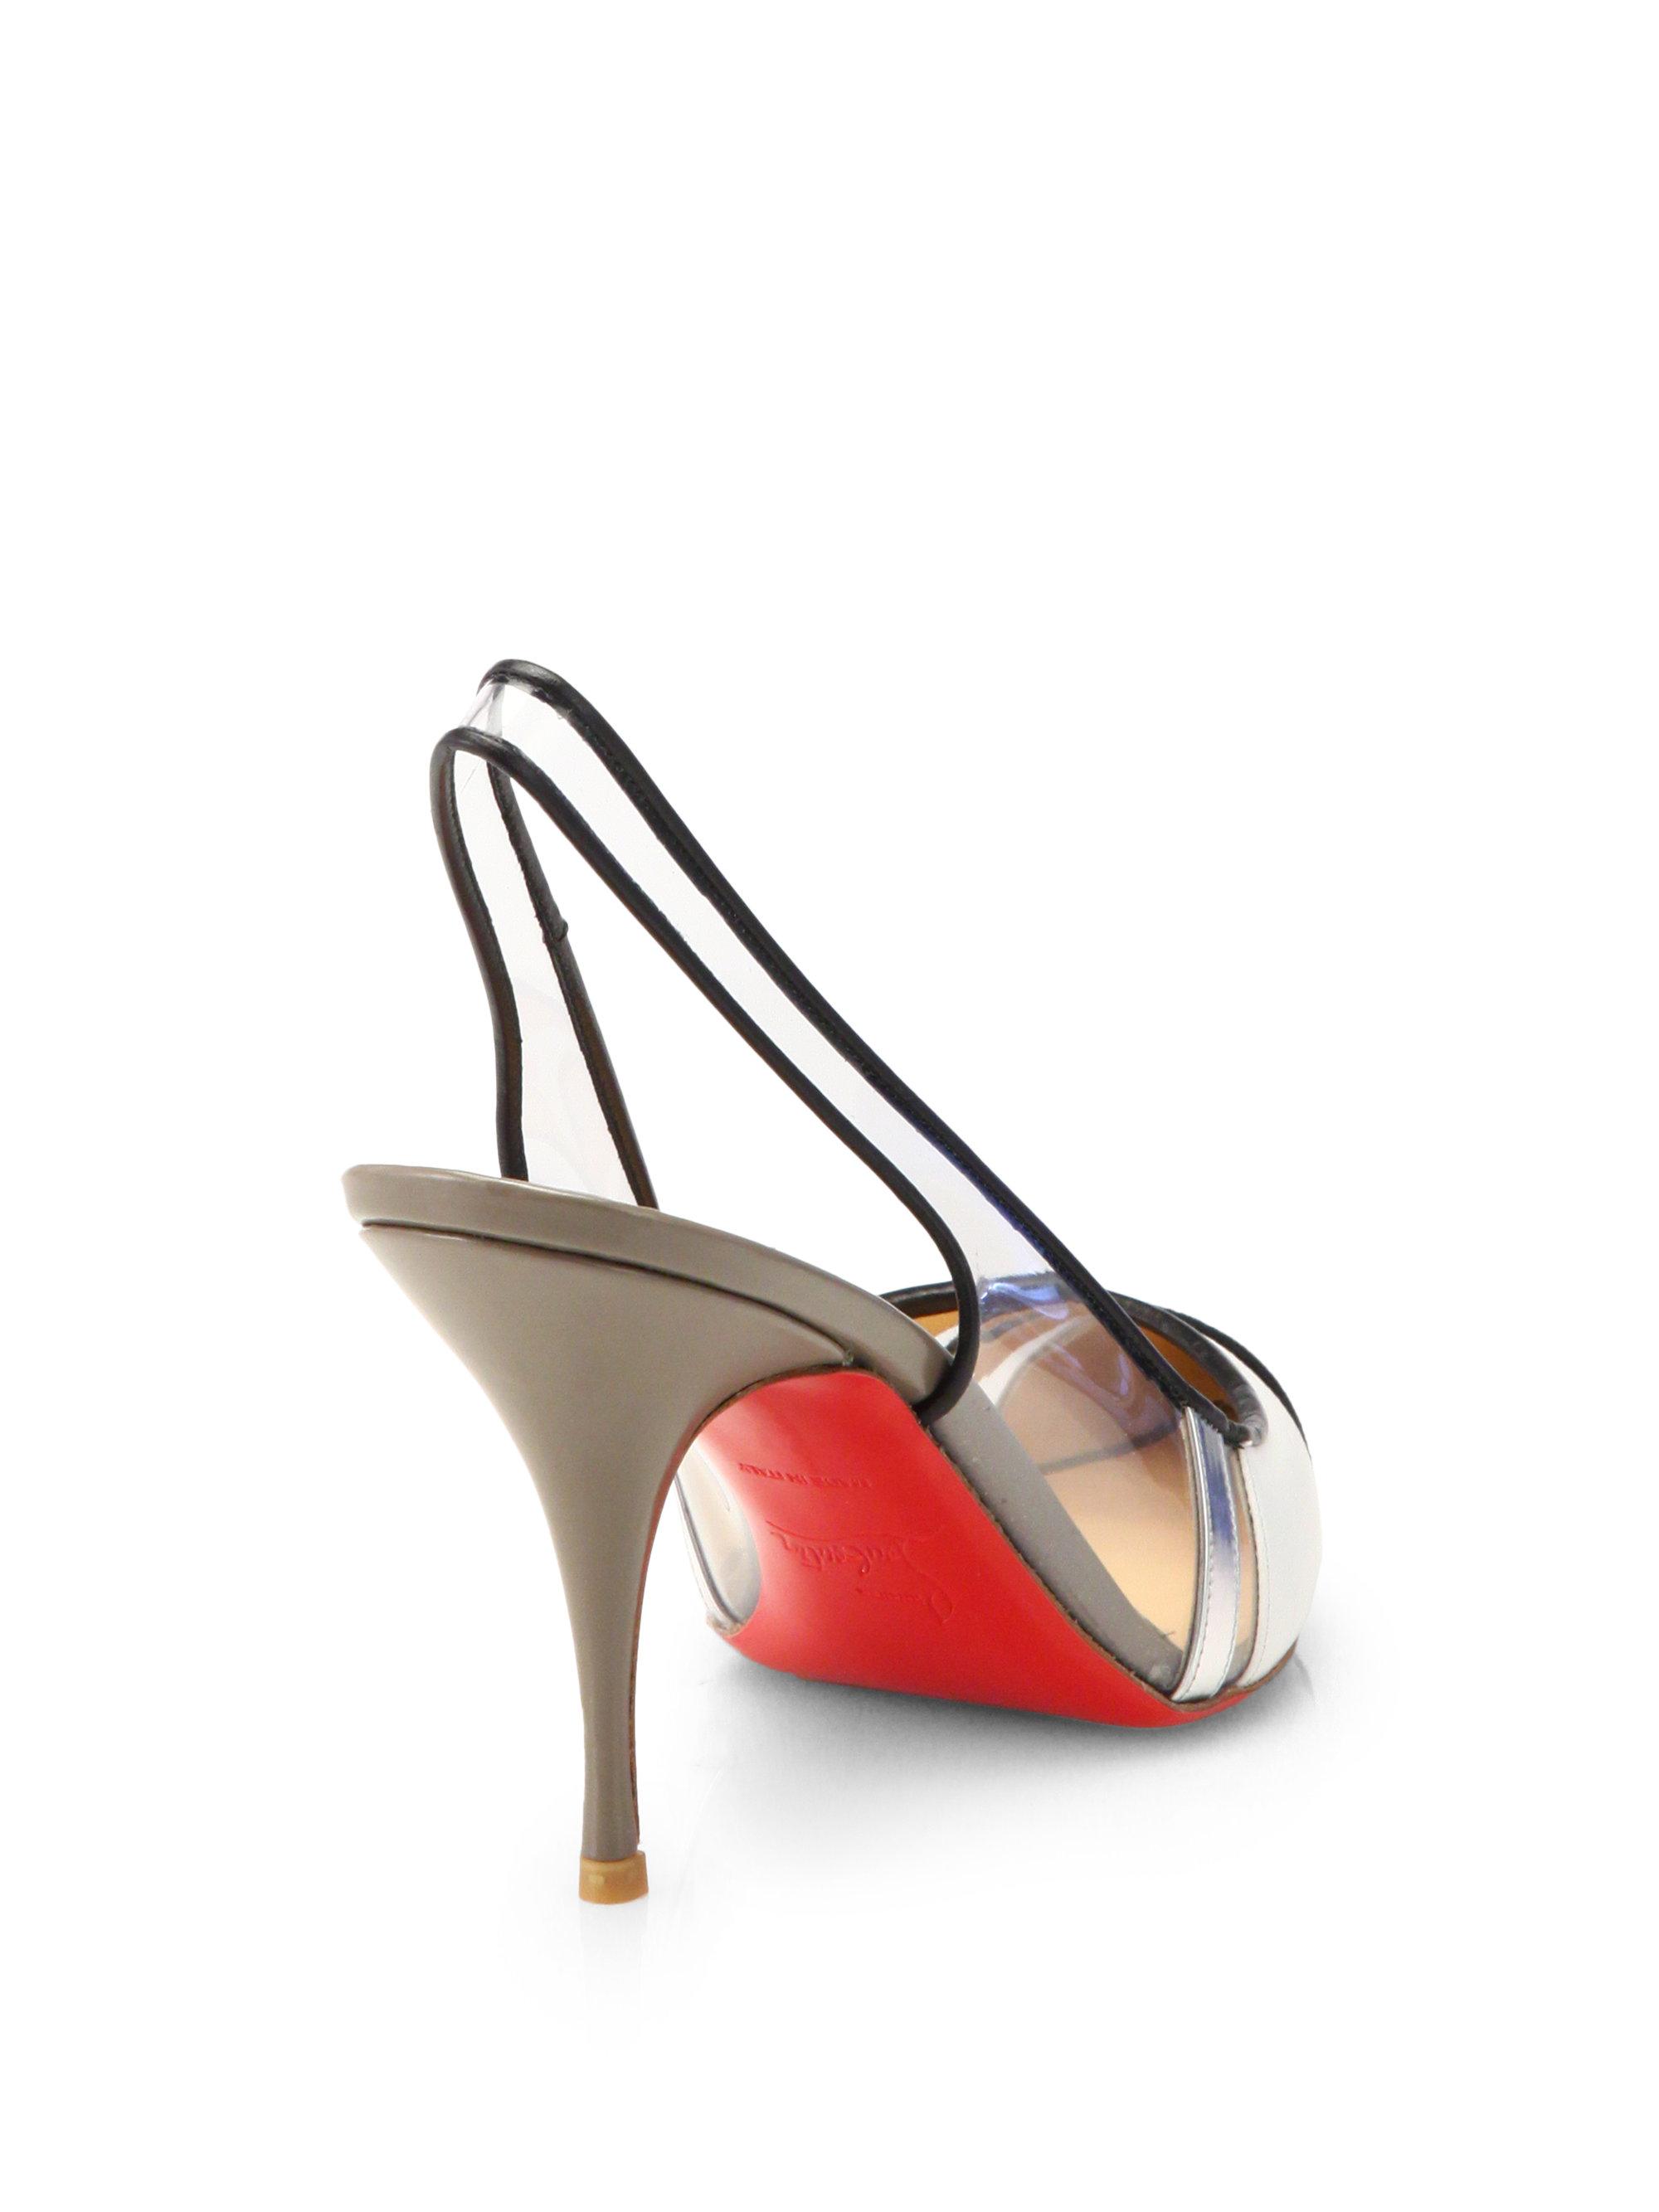 replica louboutin shoes - christian louboutin bianca studded leather platform pumps ...